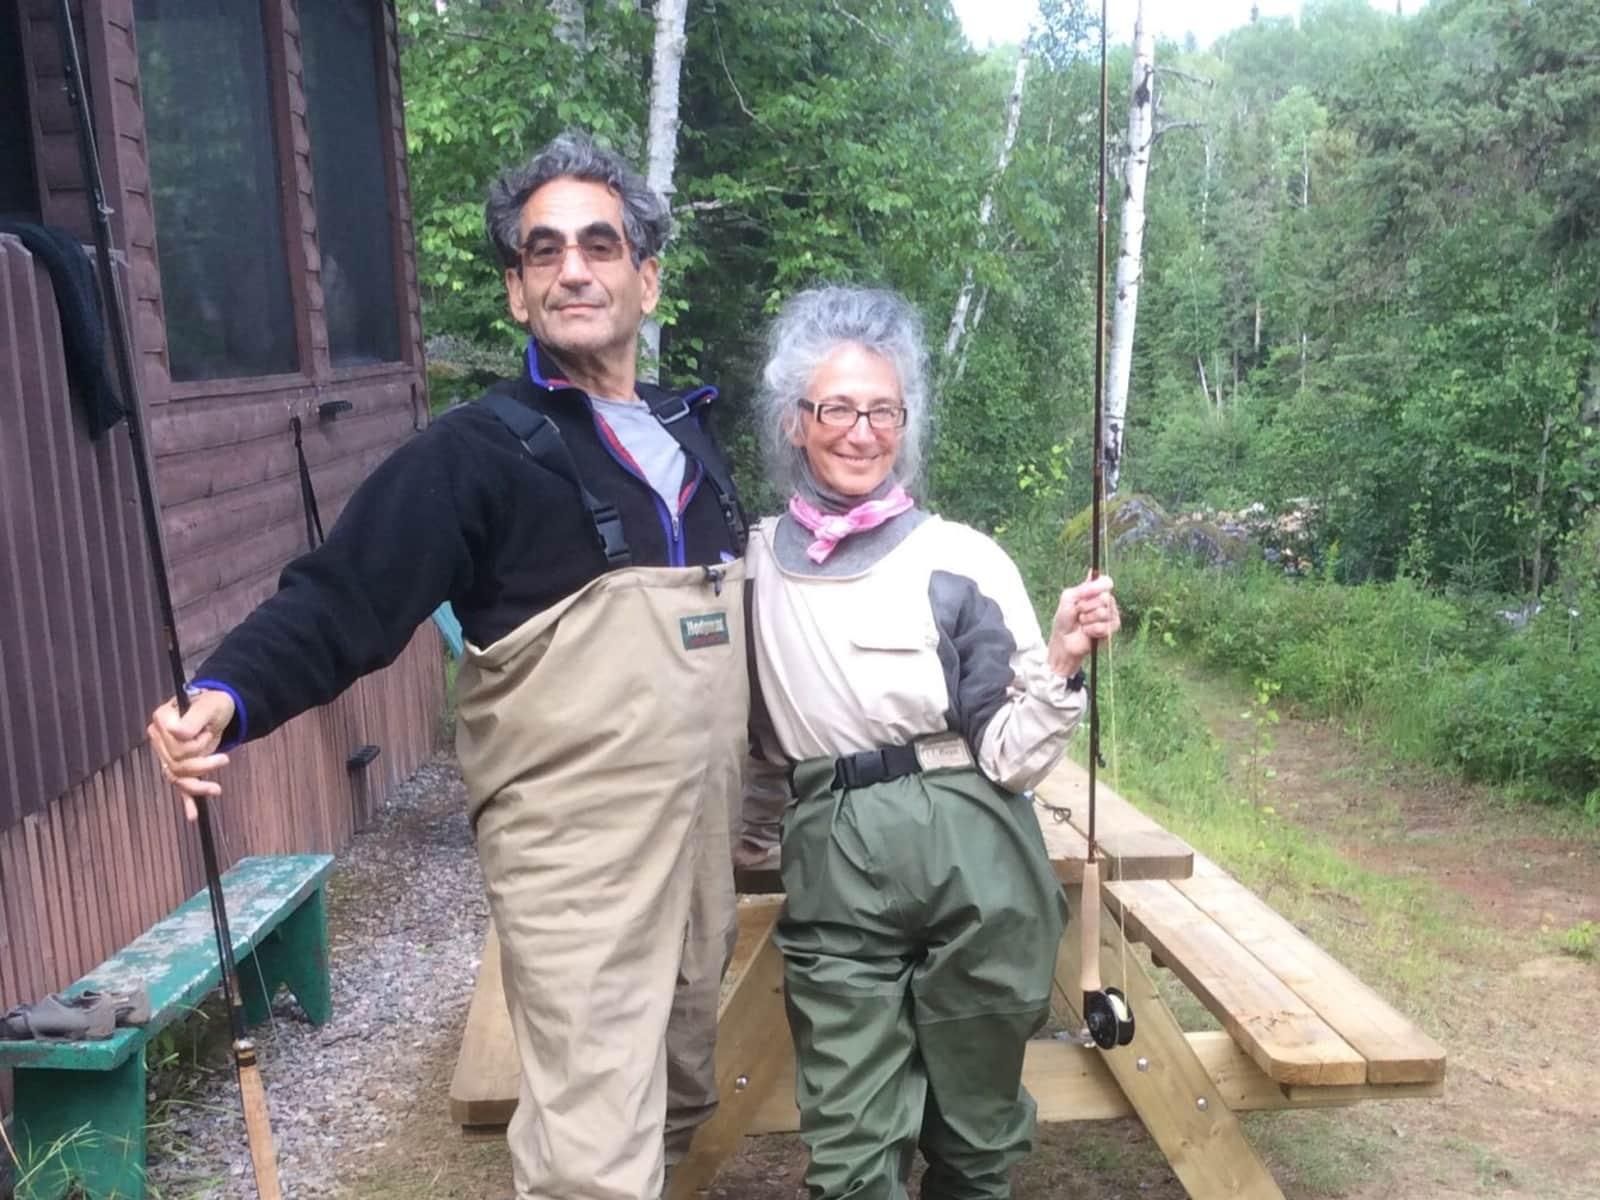 Johanne & Tony from Montréal, Quebec, Canada